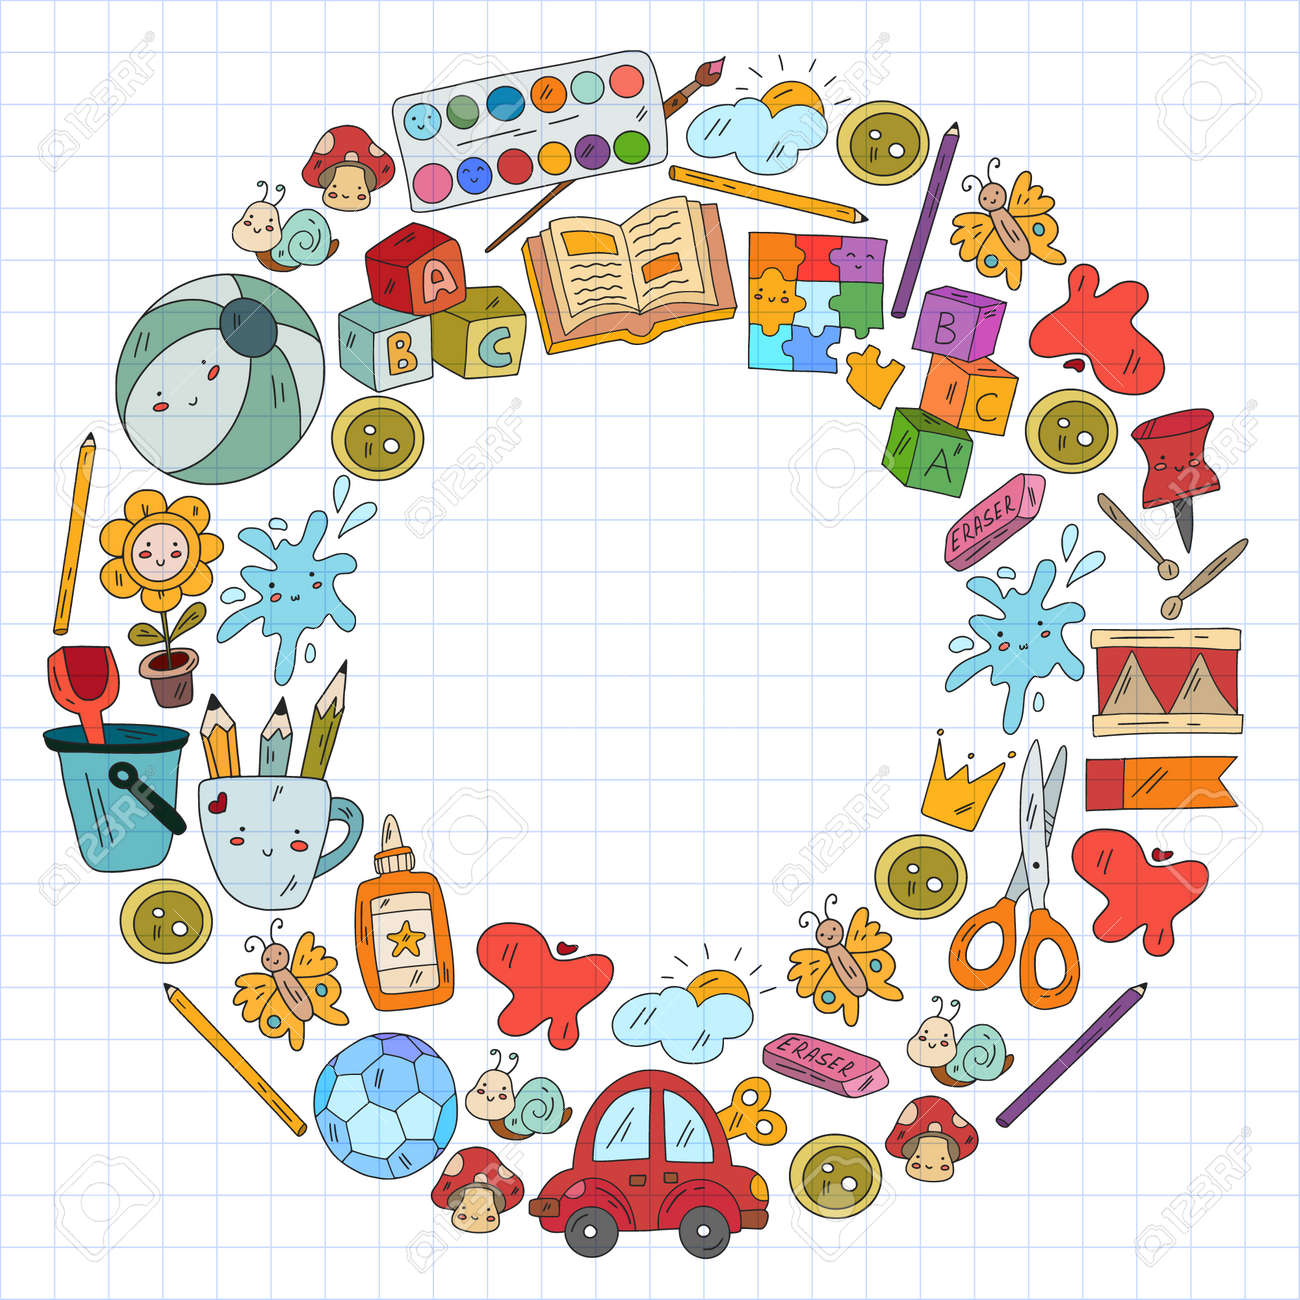 Children play with toys in the kindergarten. Kids playground. Education, creativity, imagination. - 173369567